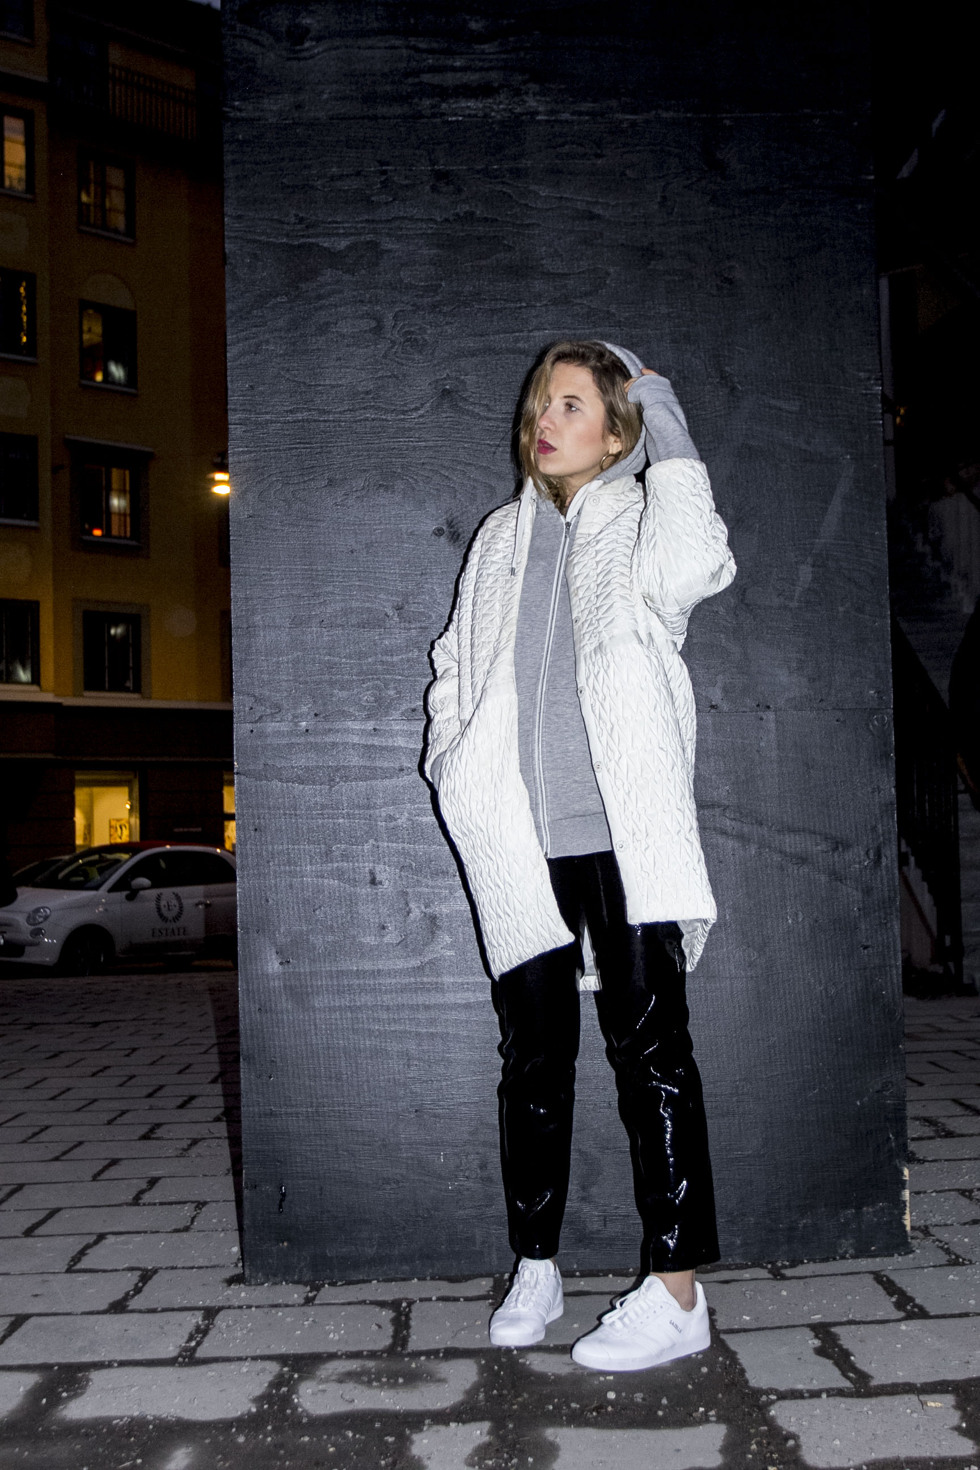 henrietta_fromholtz_outfit_1